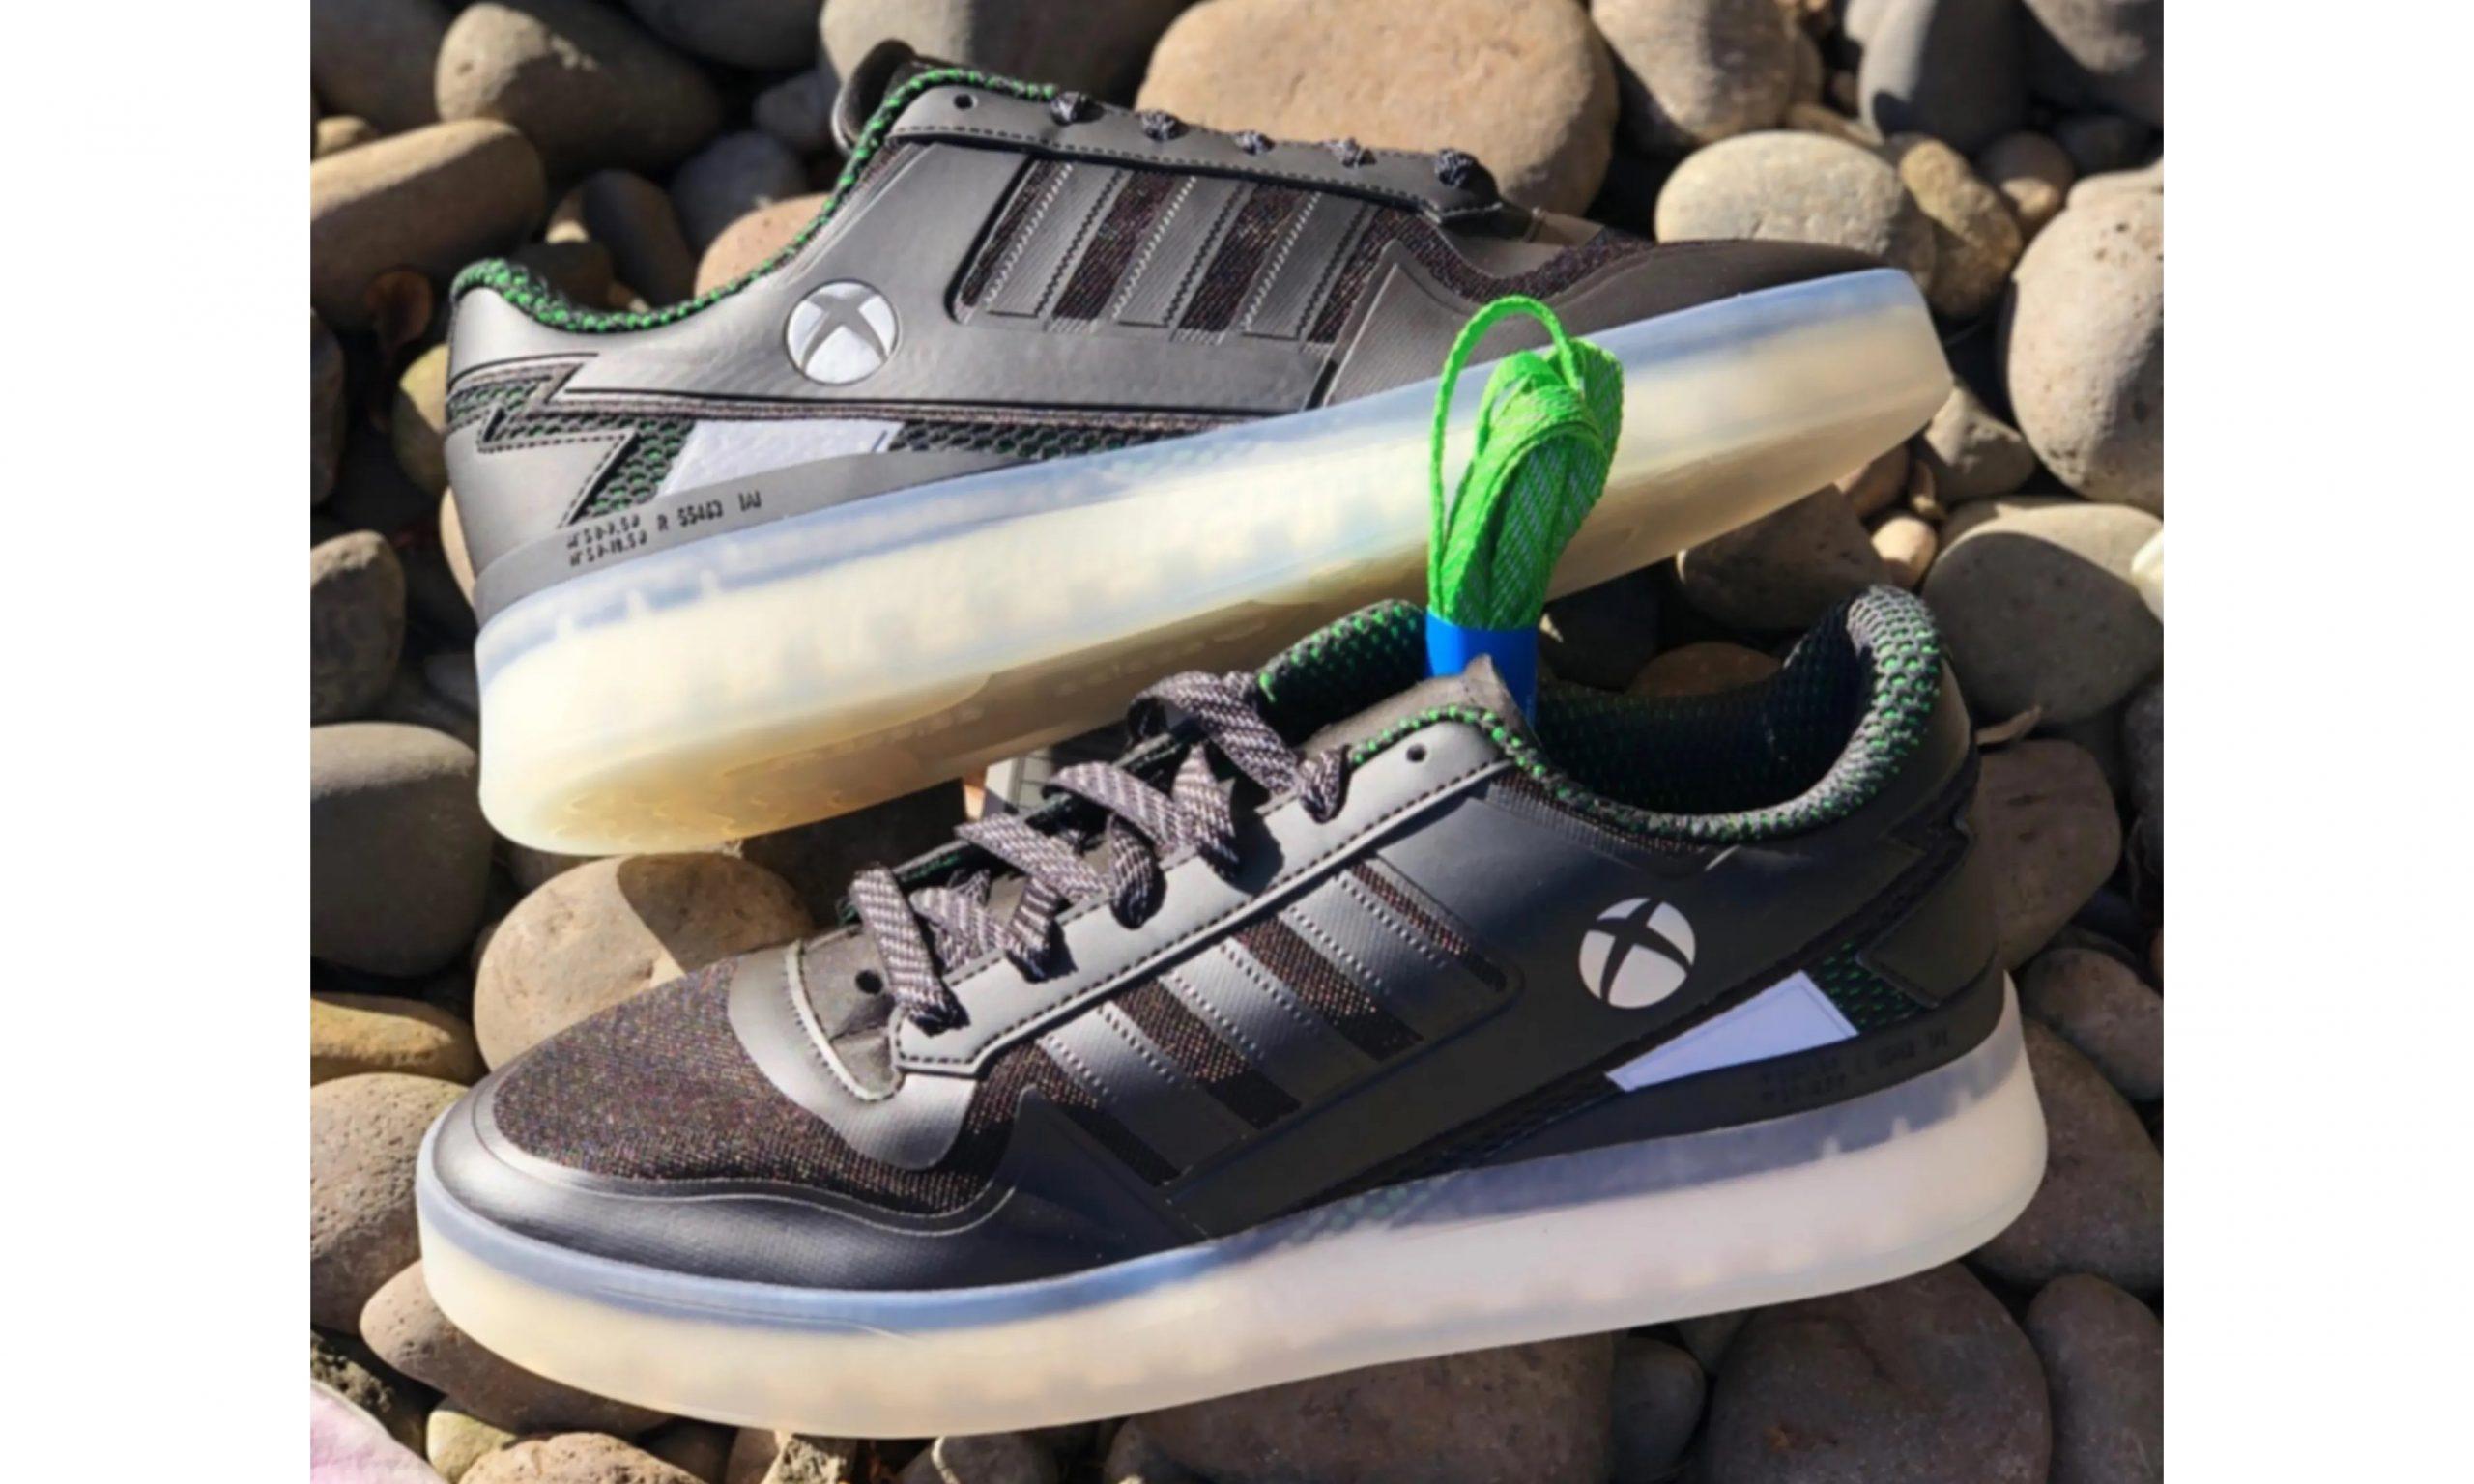 Xbox x adidas 联乘鞋款曝光